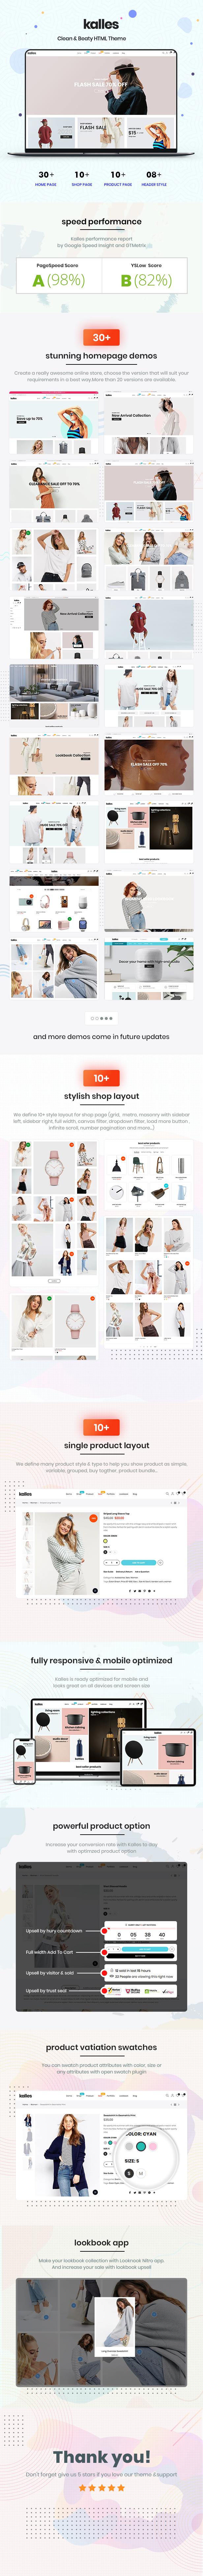 Kalles - eCommerce HTML Template - 1